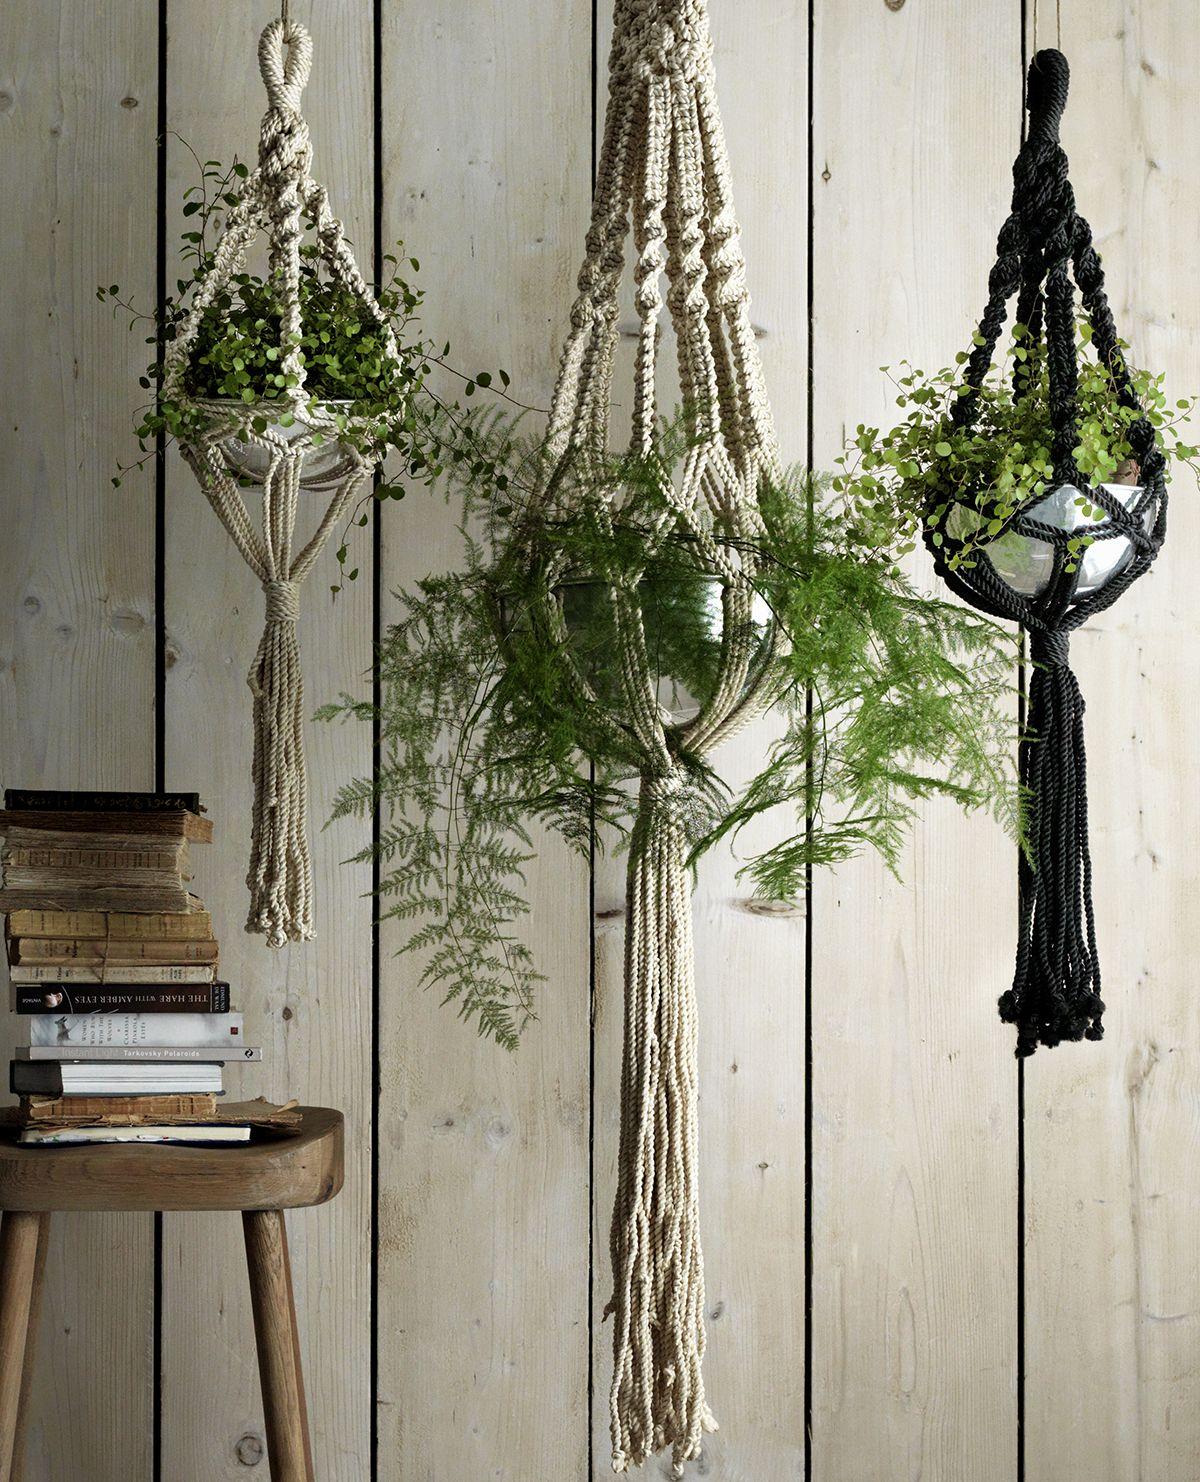 black macrame plant hanger - Google Search | Trade fair ...